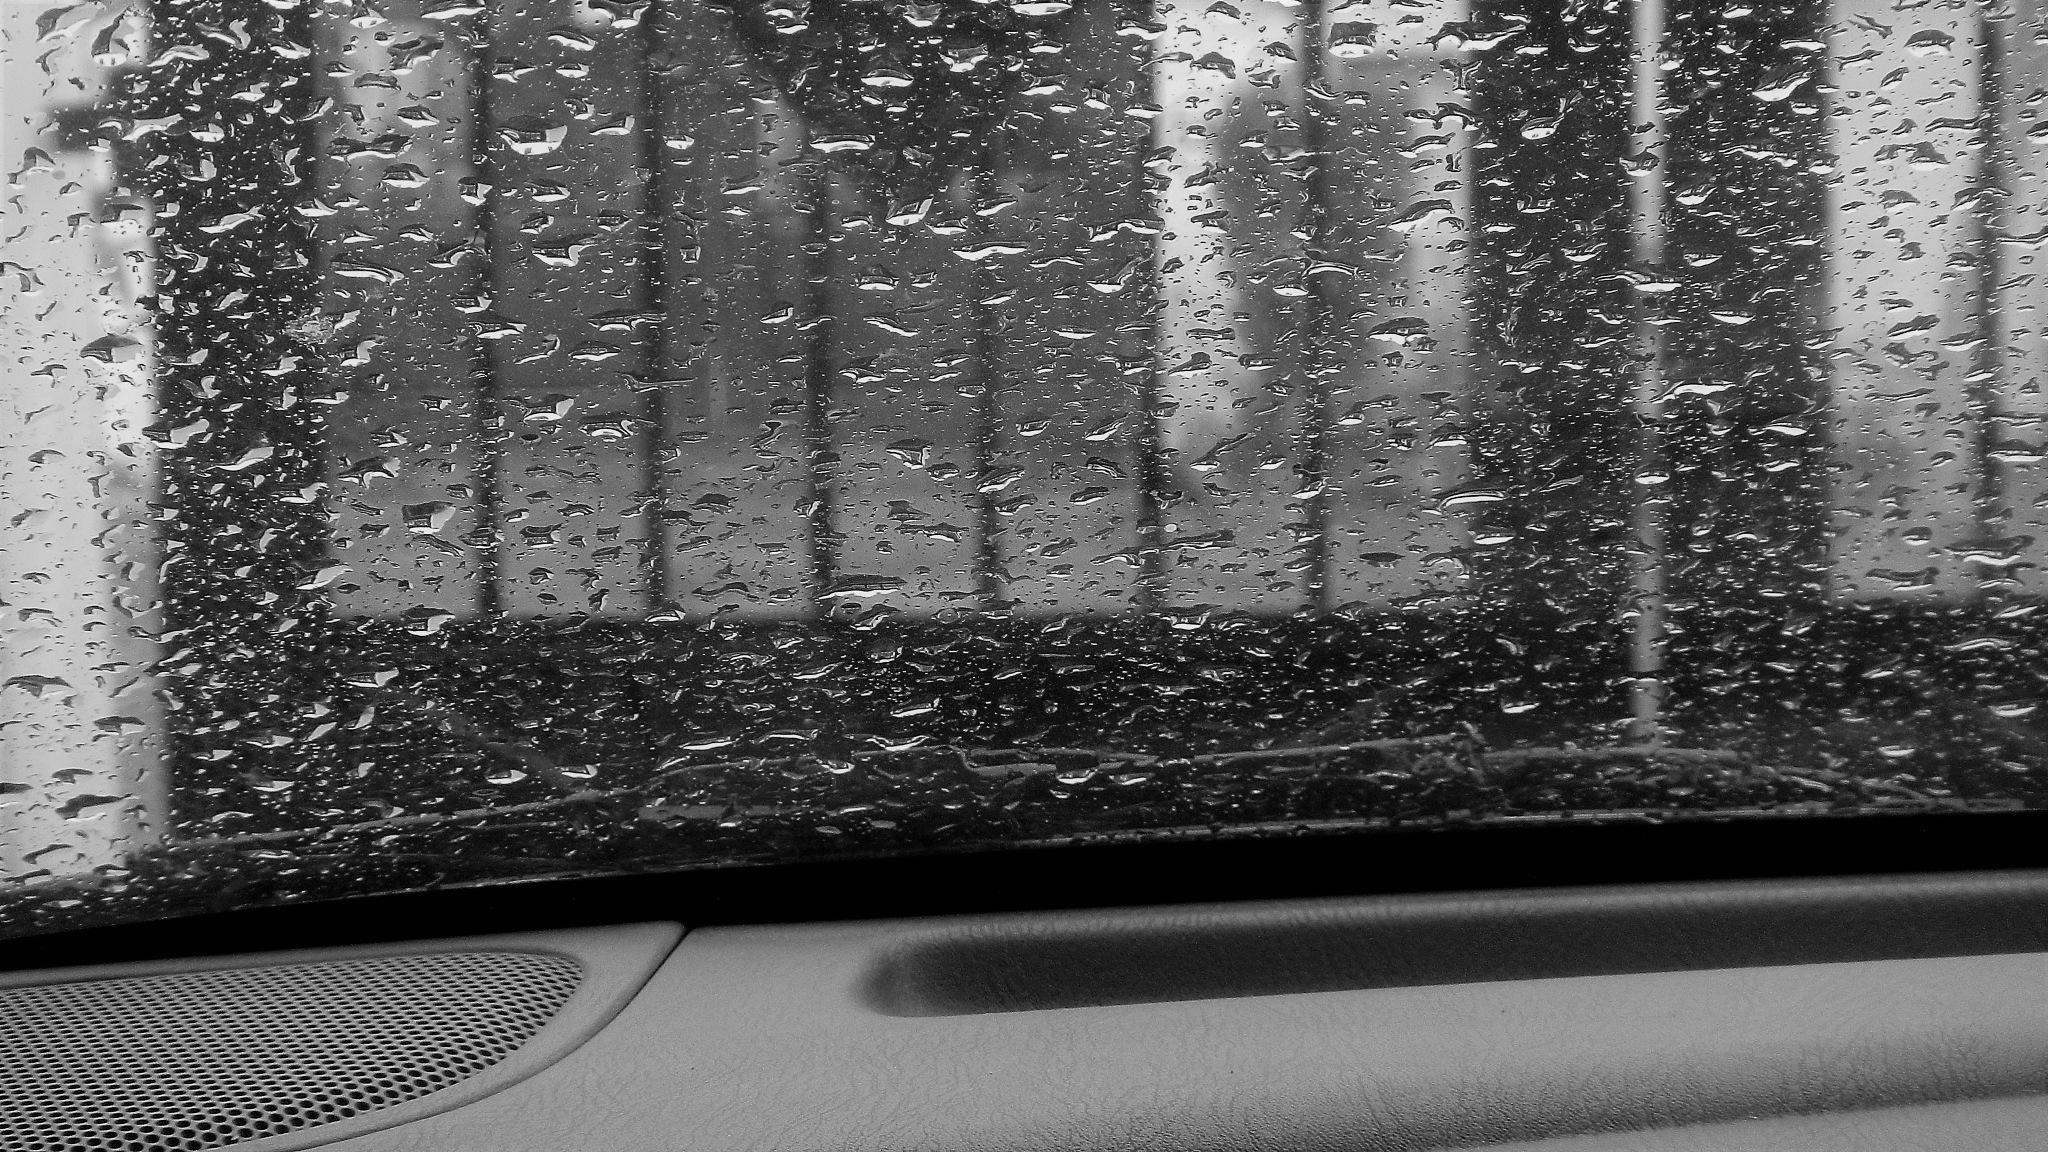 Raining by अनूप यादव (pixelzz)